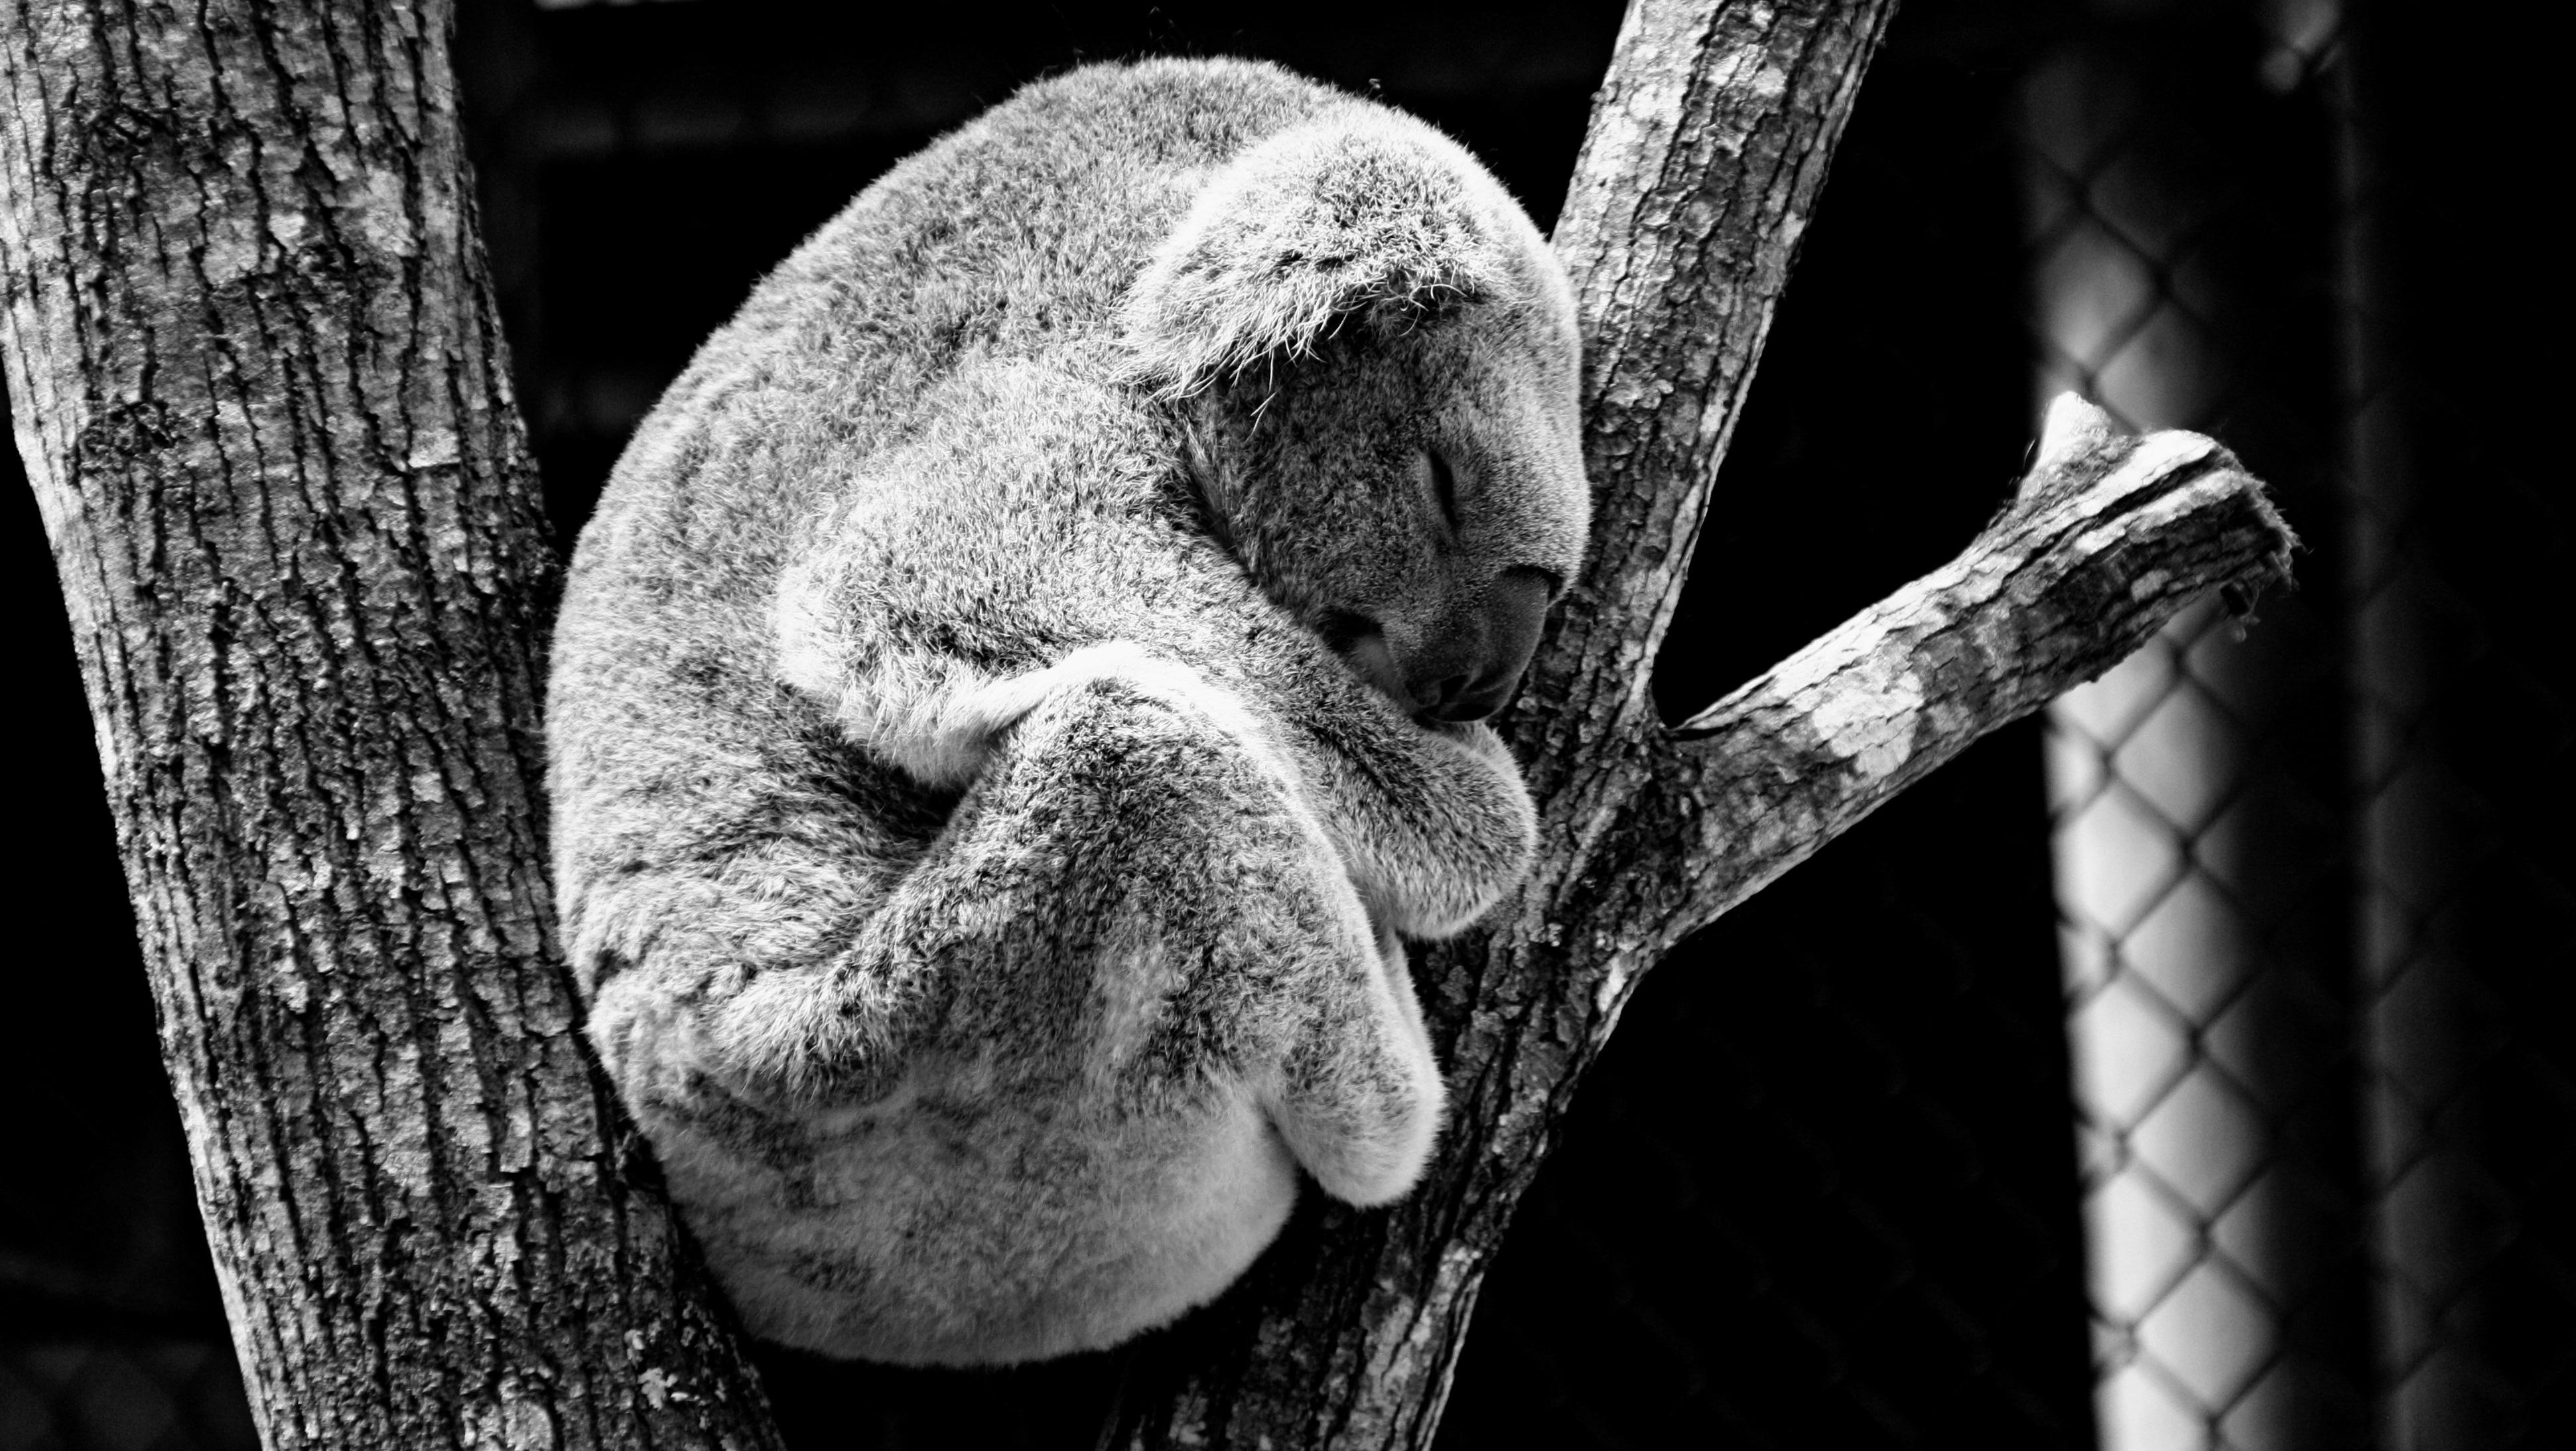 Greyscale Photography of Koala in Between Tree Trunks